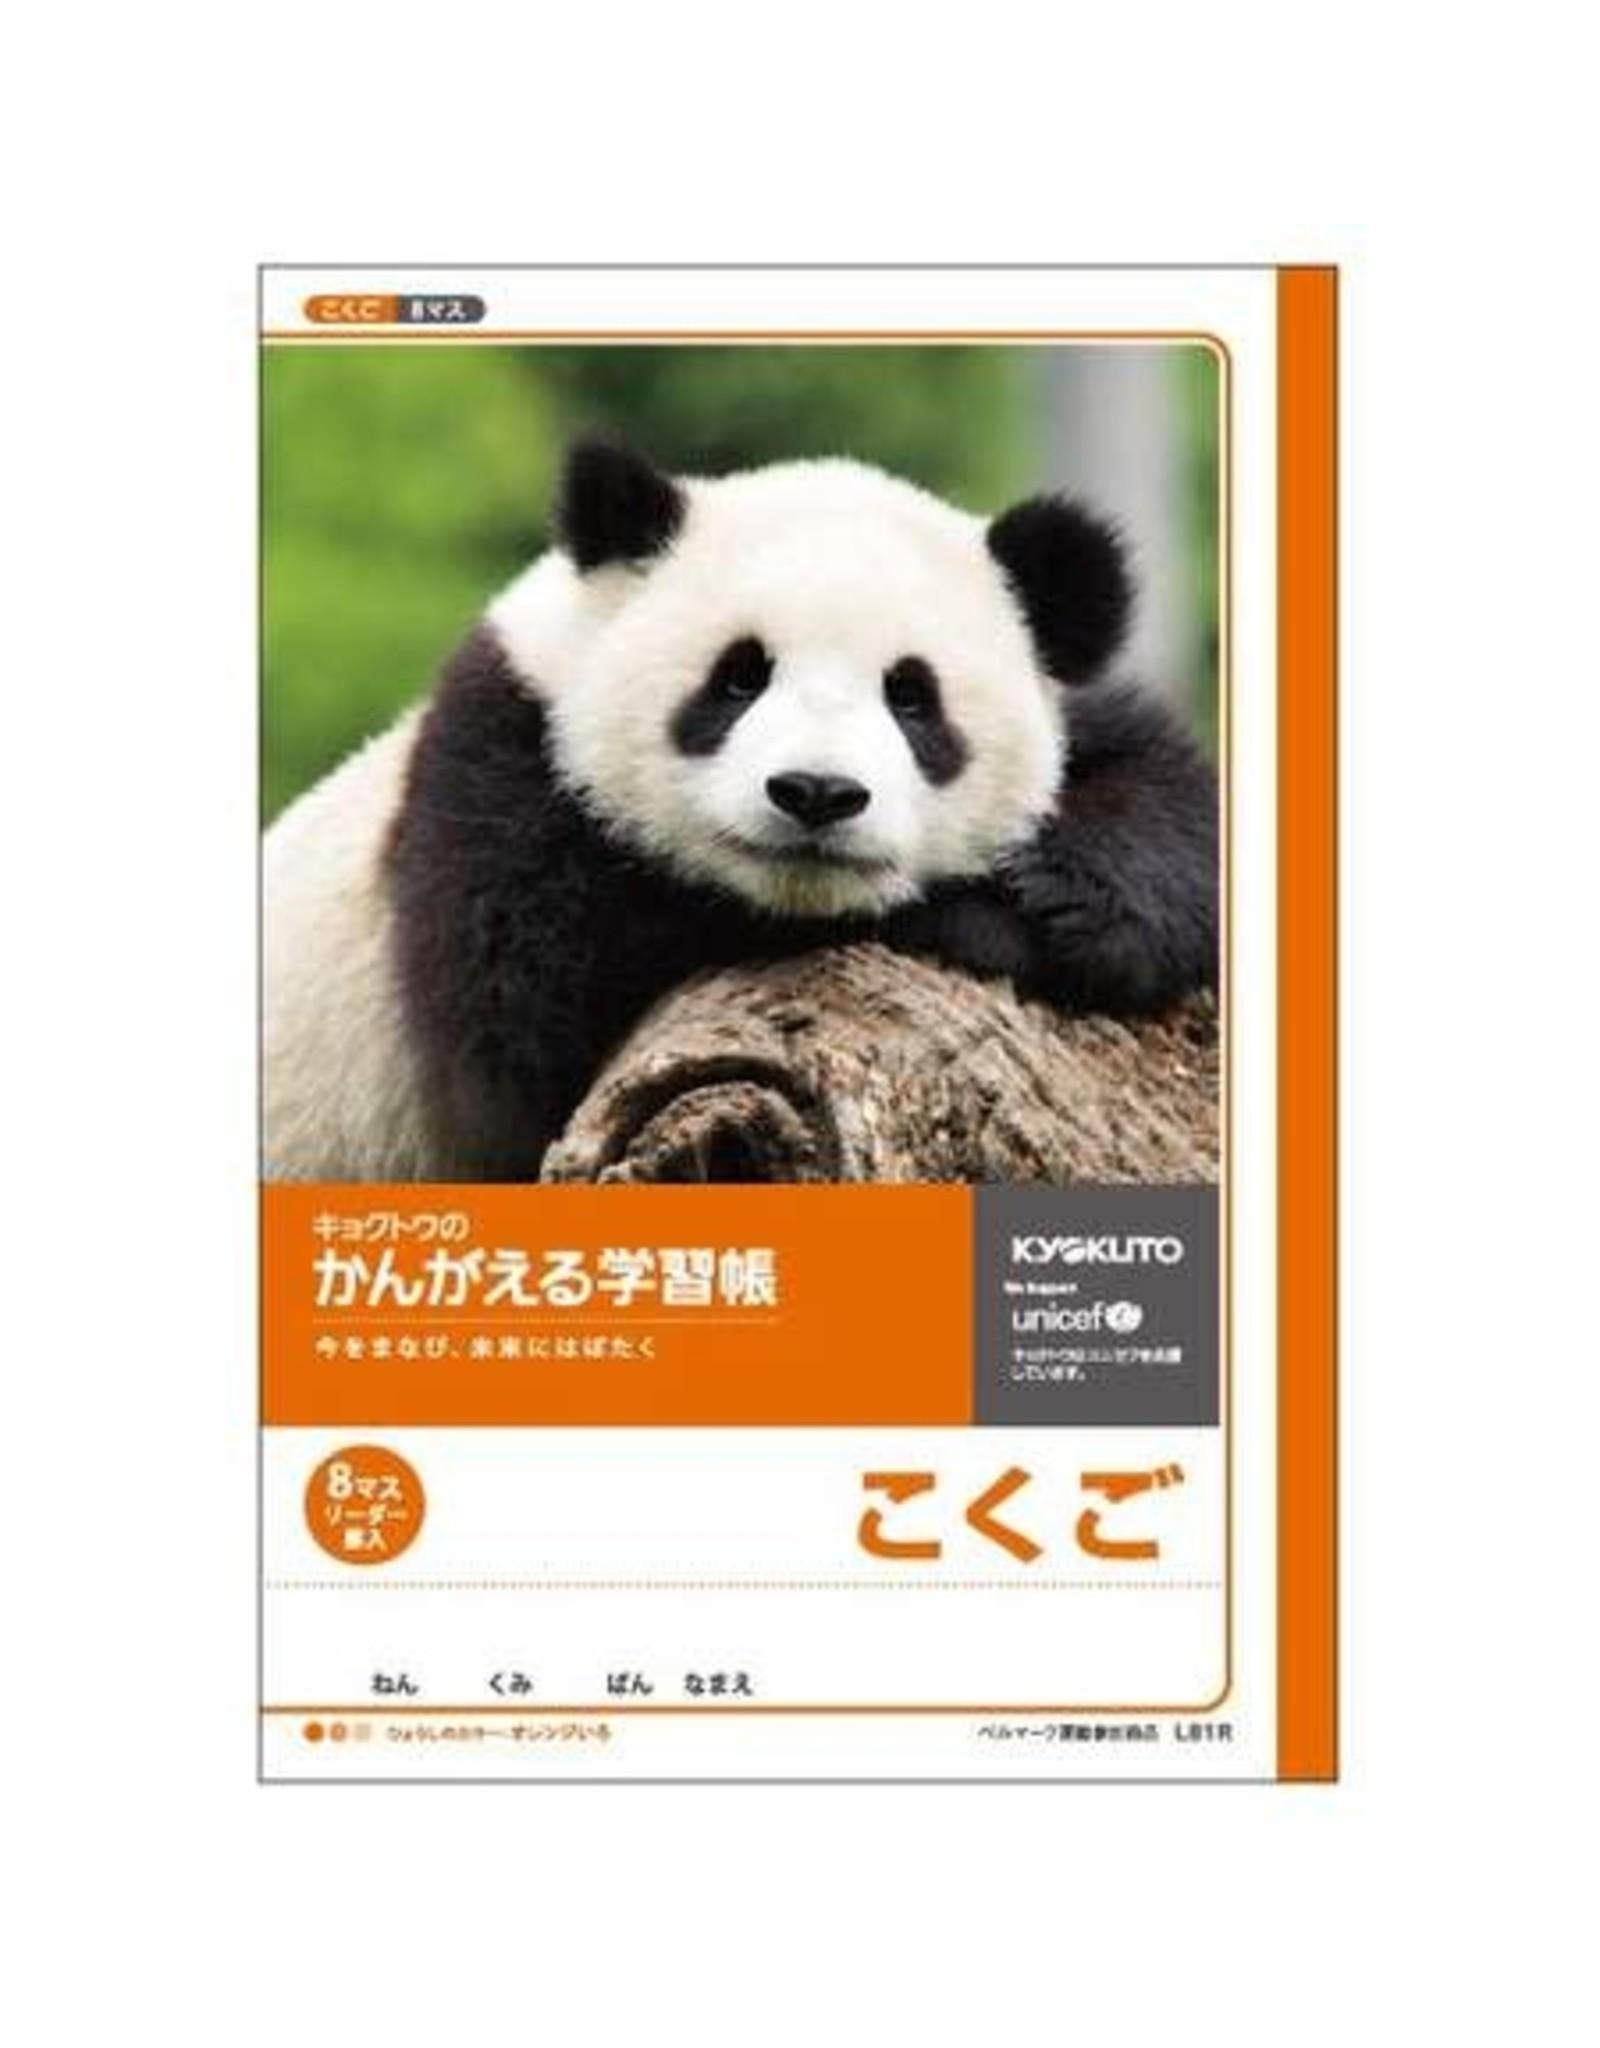 Kyokuto Associates co., ltd. STUDY NOTEBOOK KOKUGO 8 GRIDS